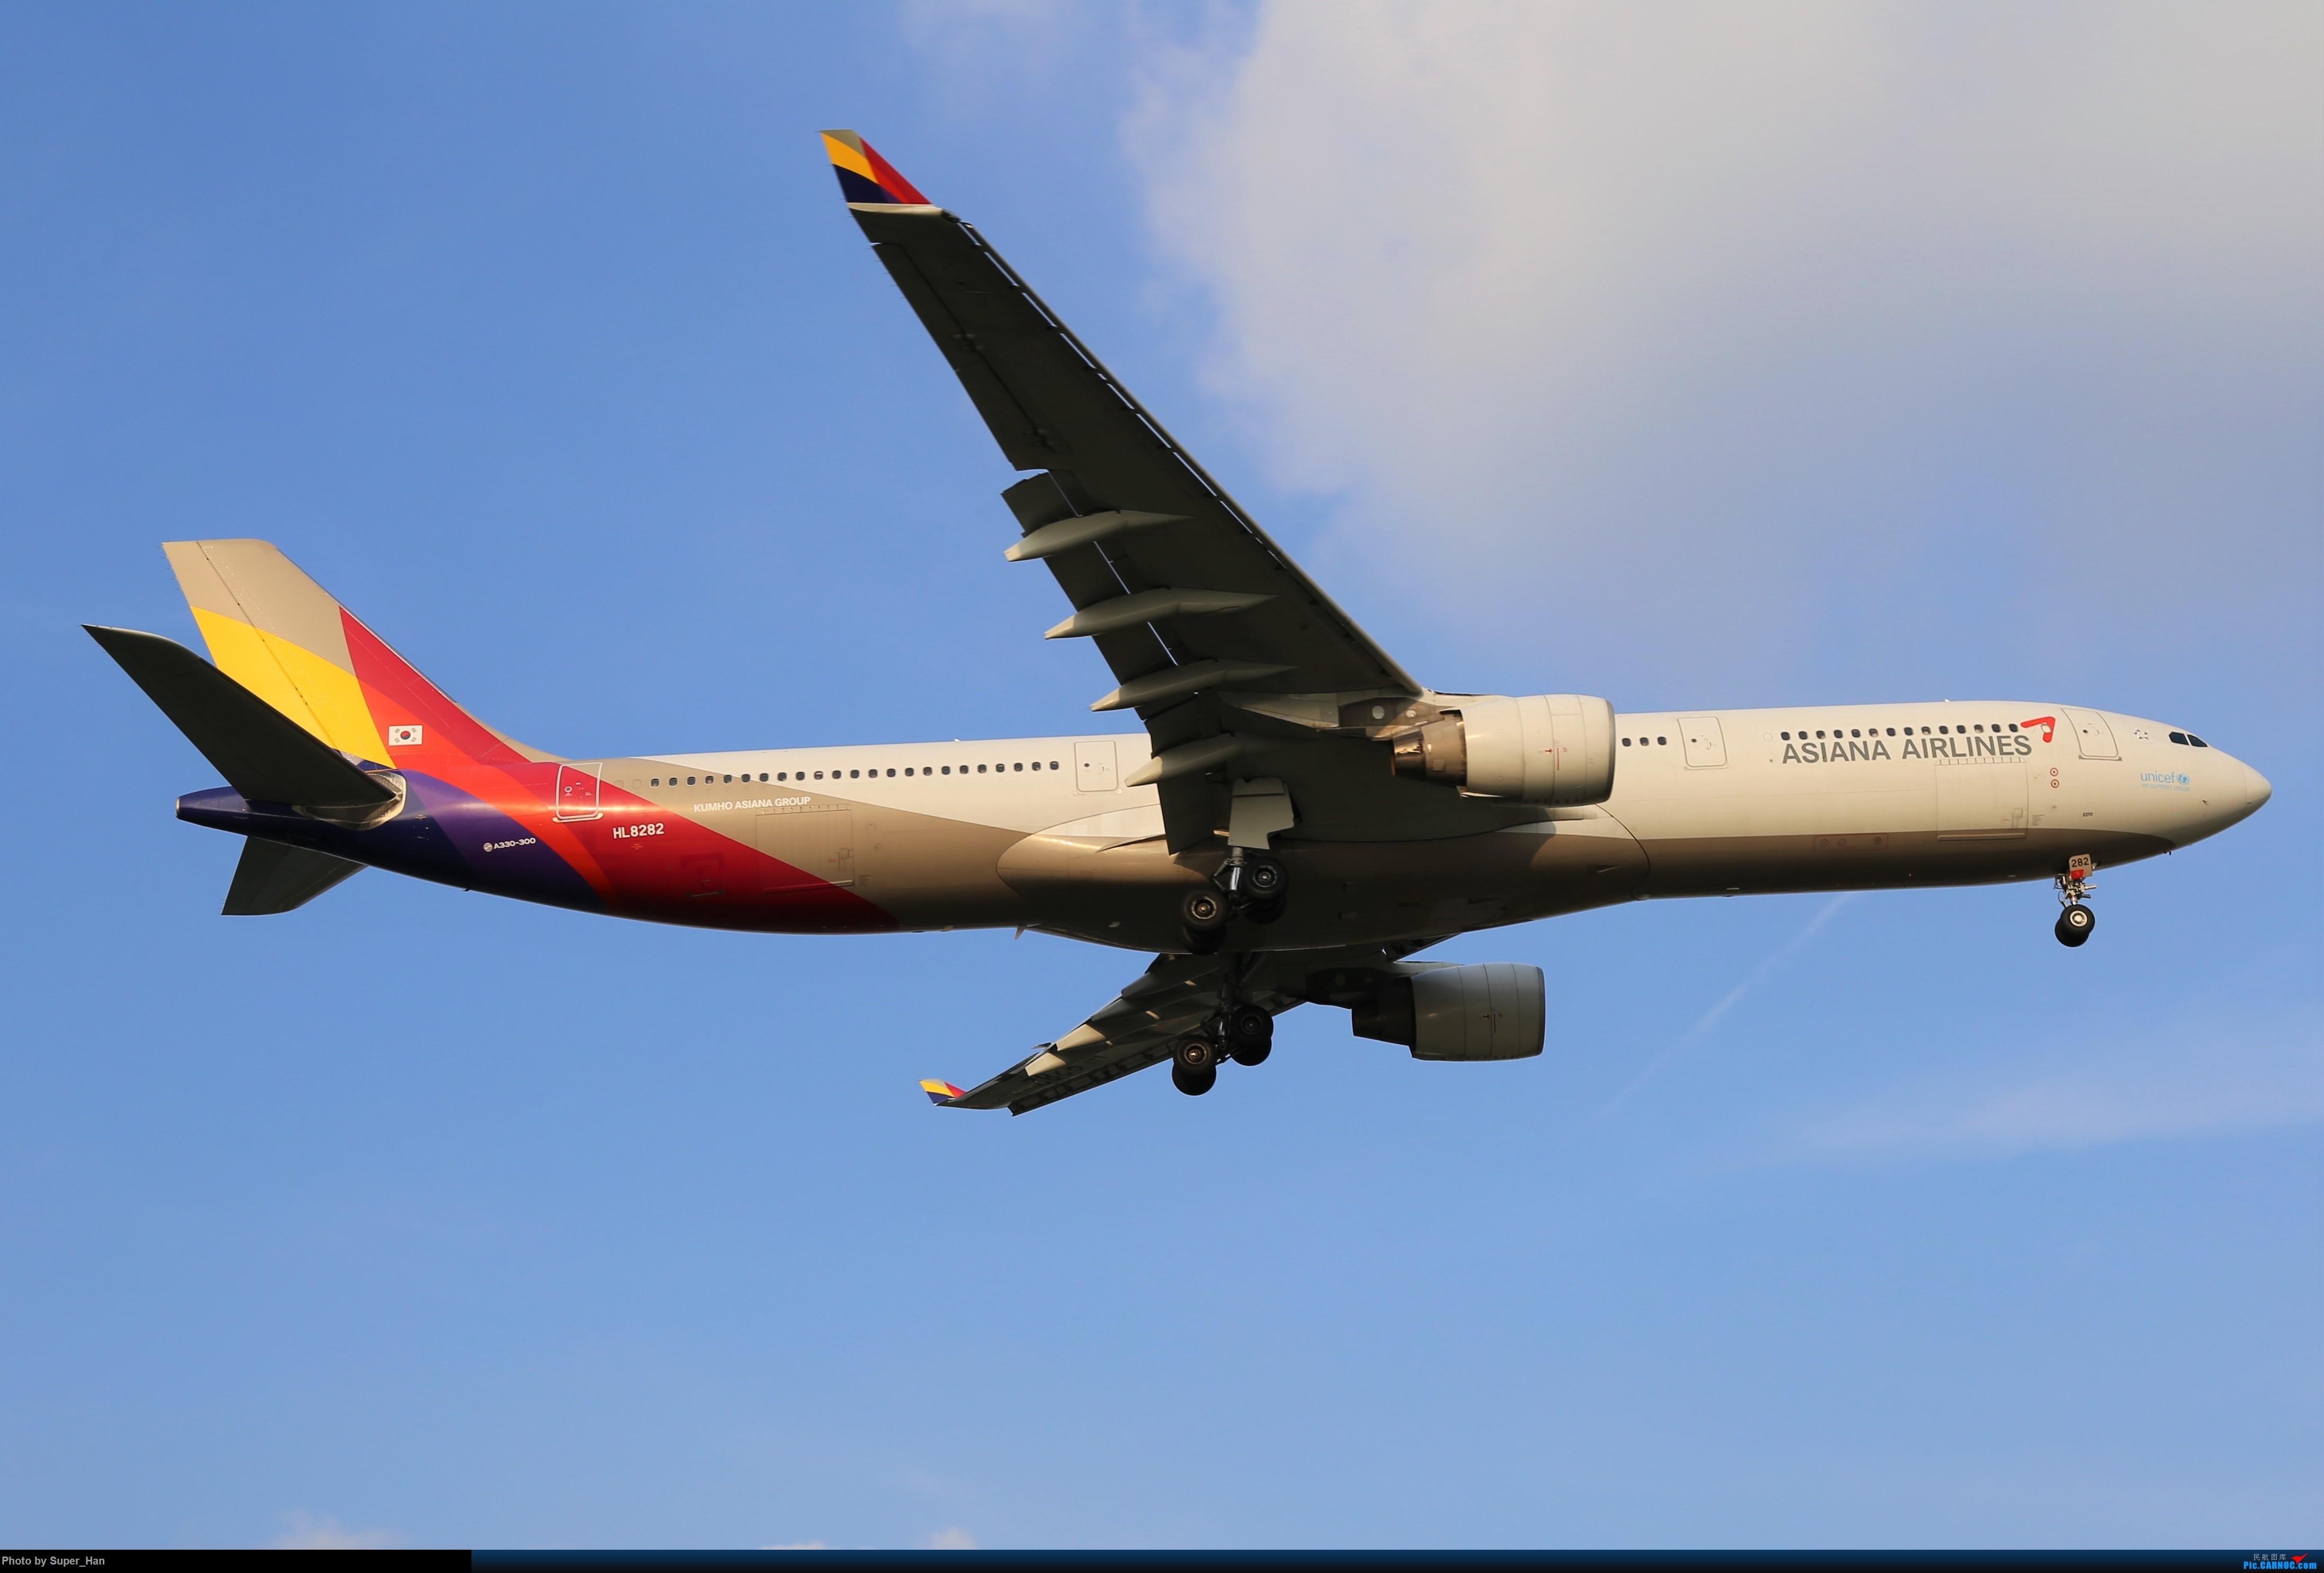 Re:[原创]0715去虹桥说走就走【最多的330篇】 AIRBUS A330-300 HL8282 中国上海虹桥国际机场